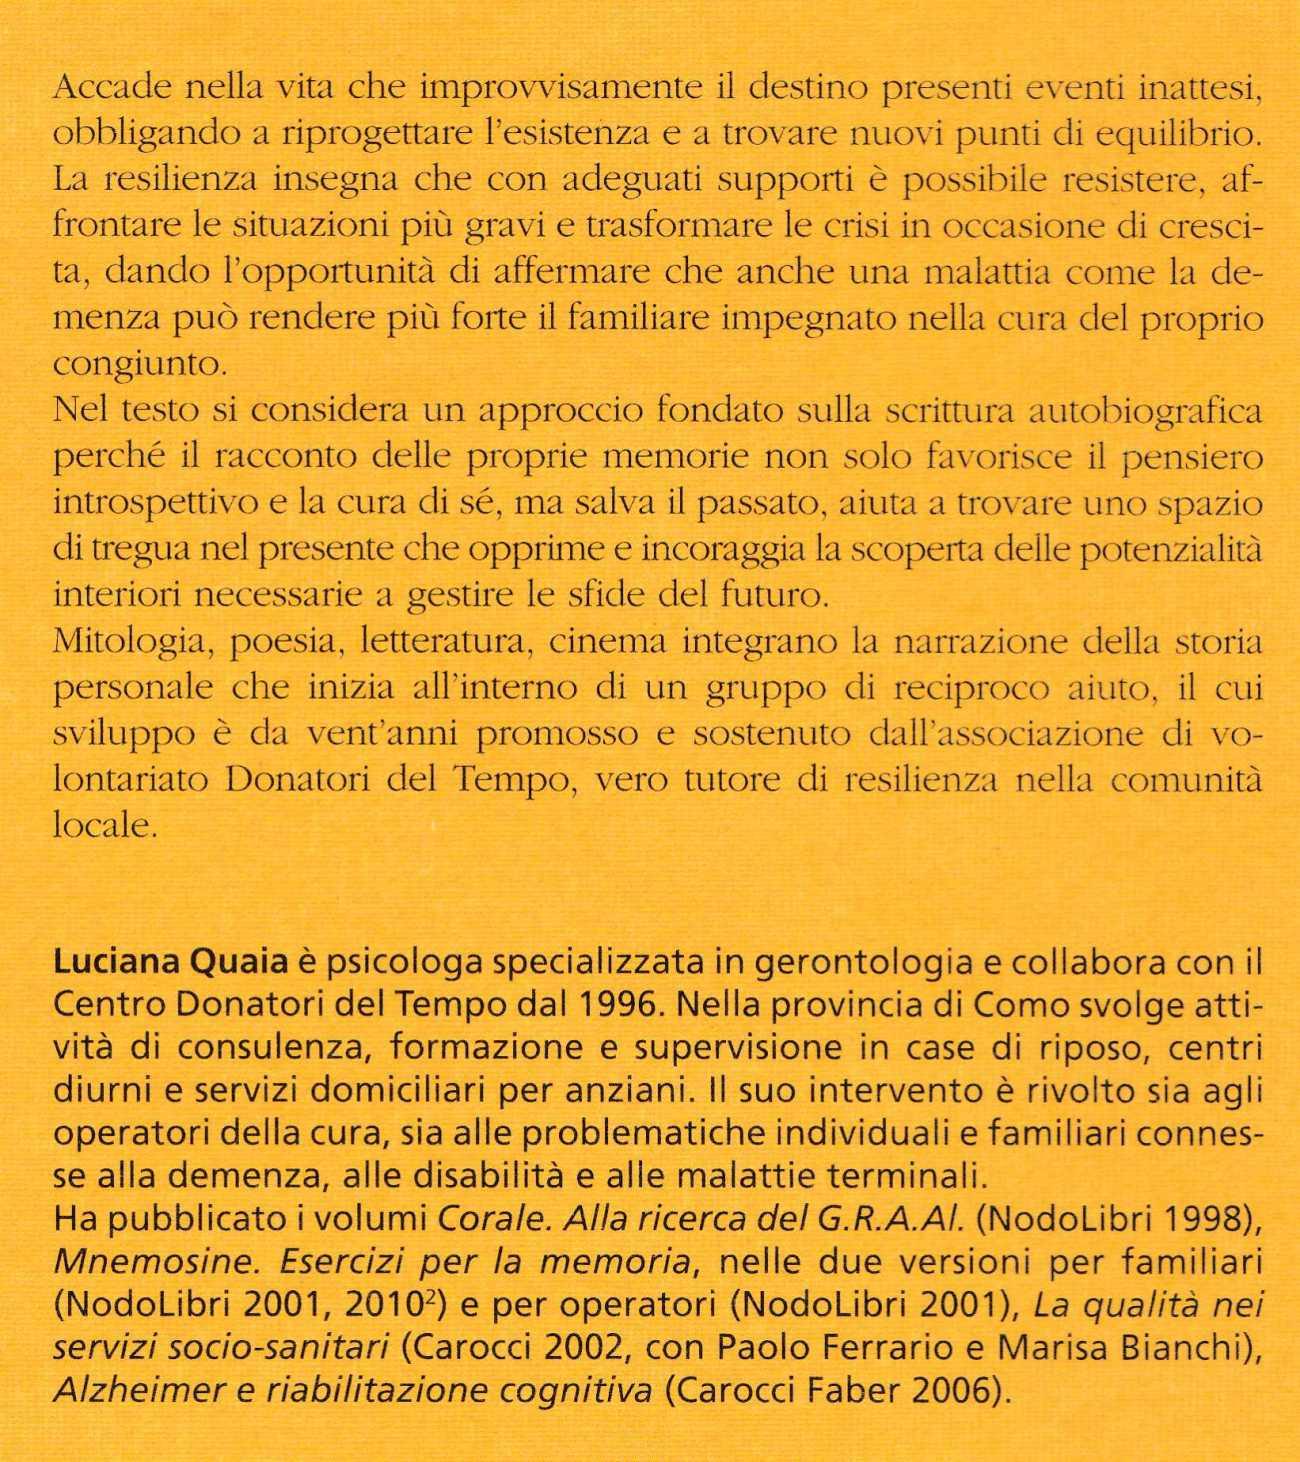 luciana-quaia-intime-erranze4943